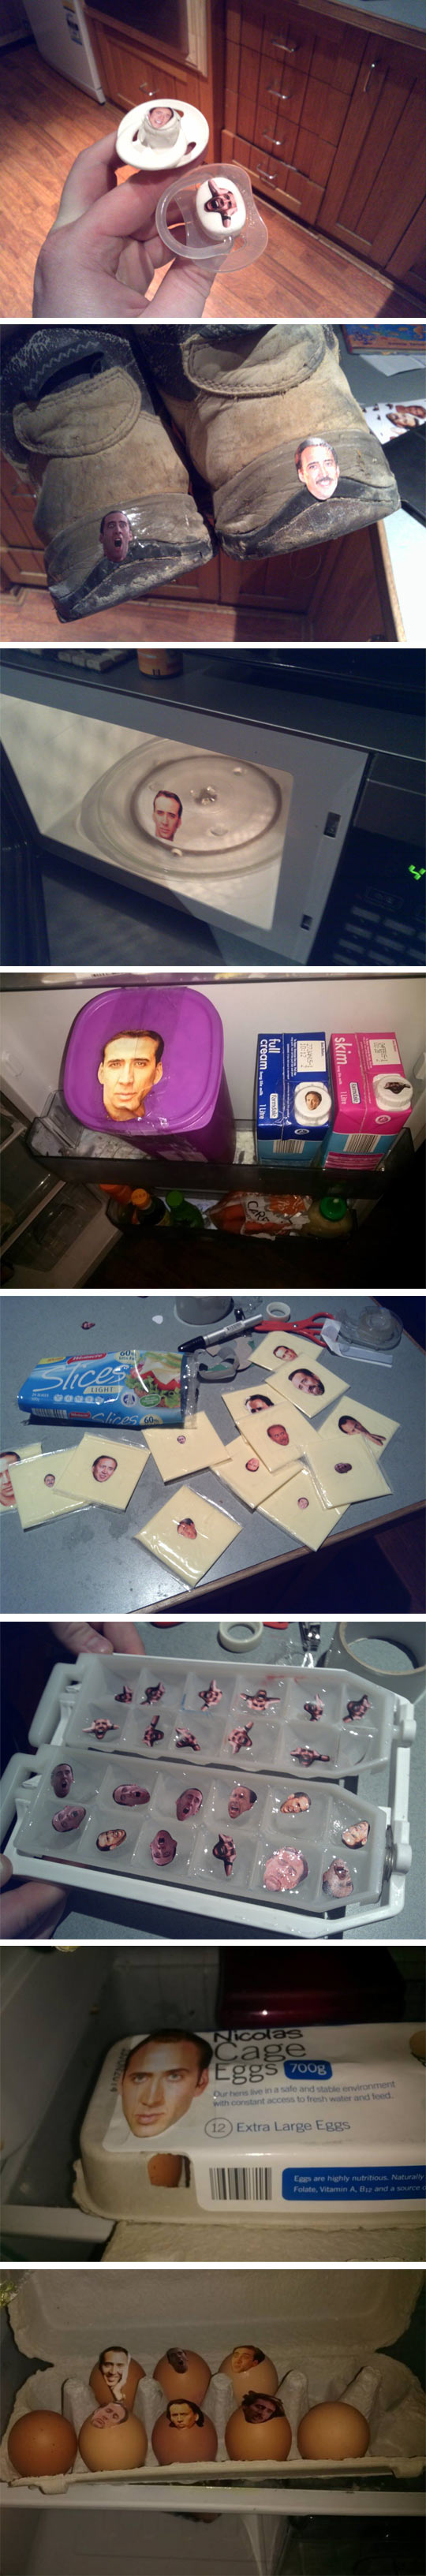 funny-Nicolas-Cage-prank-house-eggs